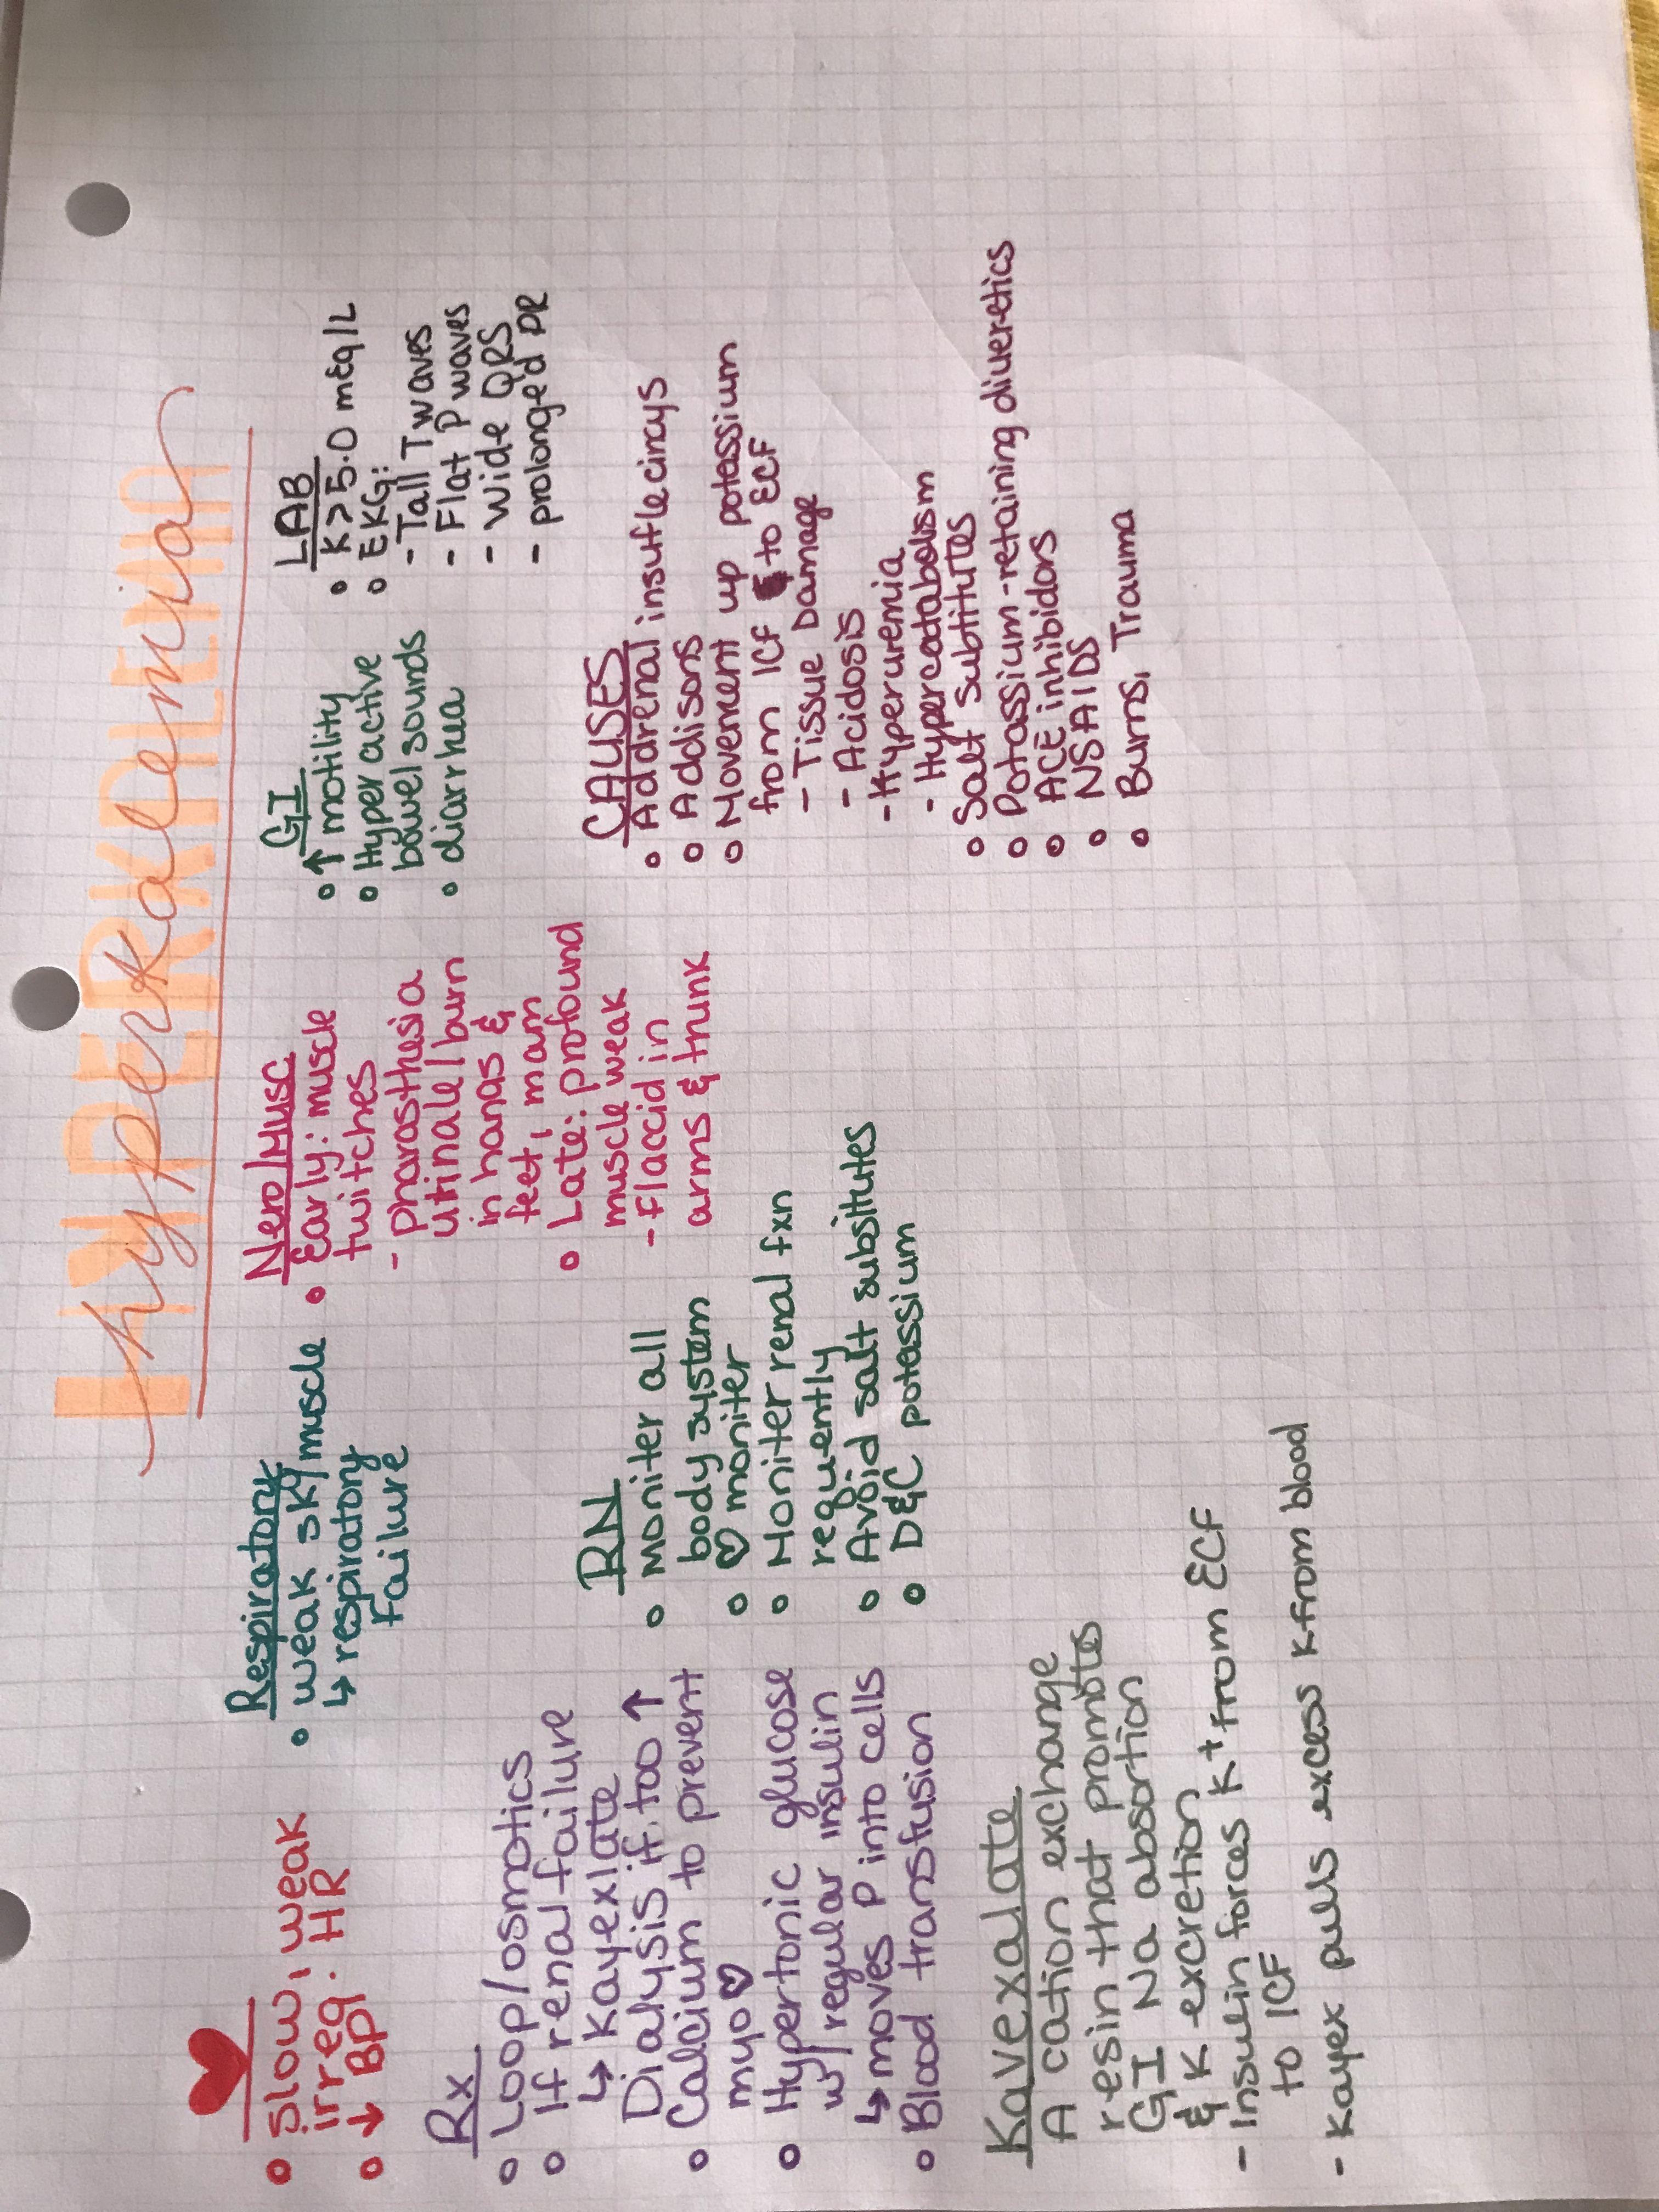 Pin by MehndiByKeila on Nursing Nsaids, Bullet journal